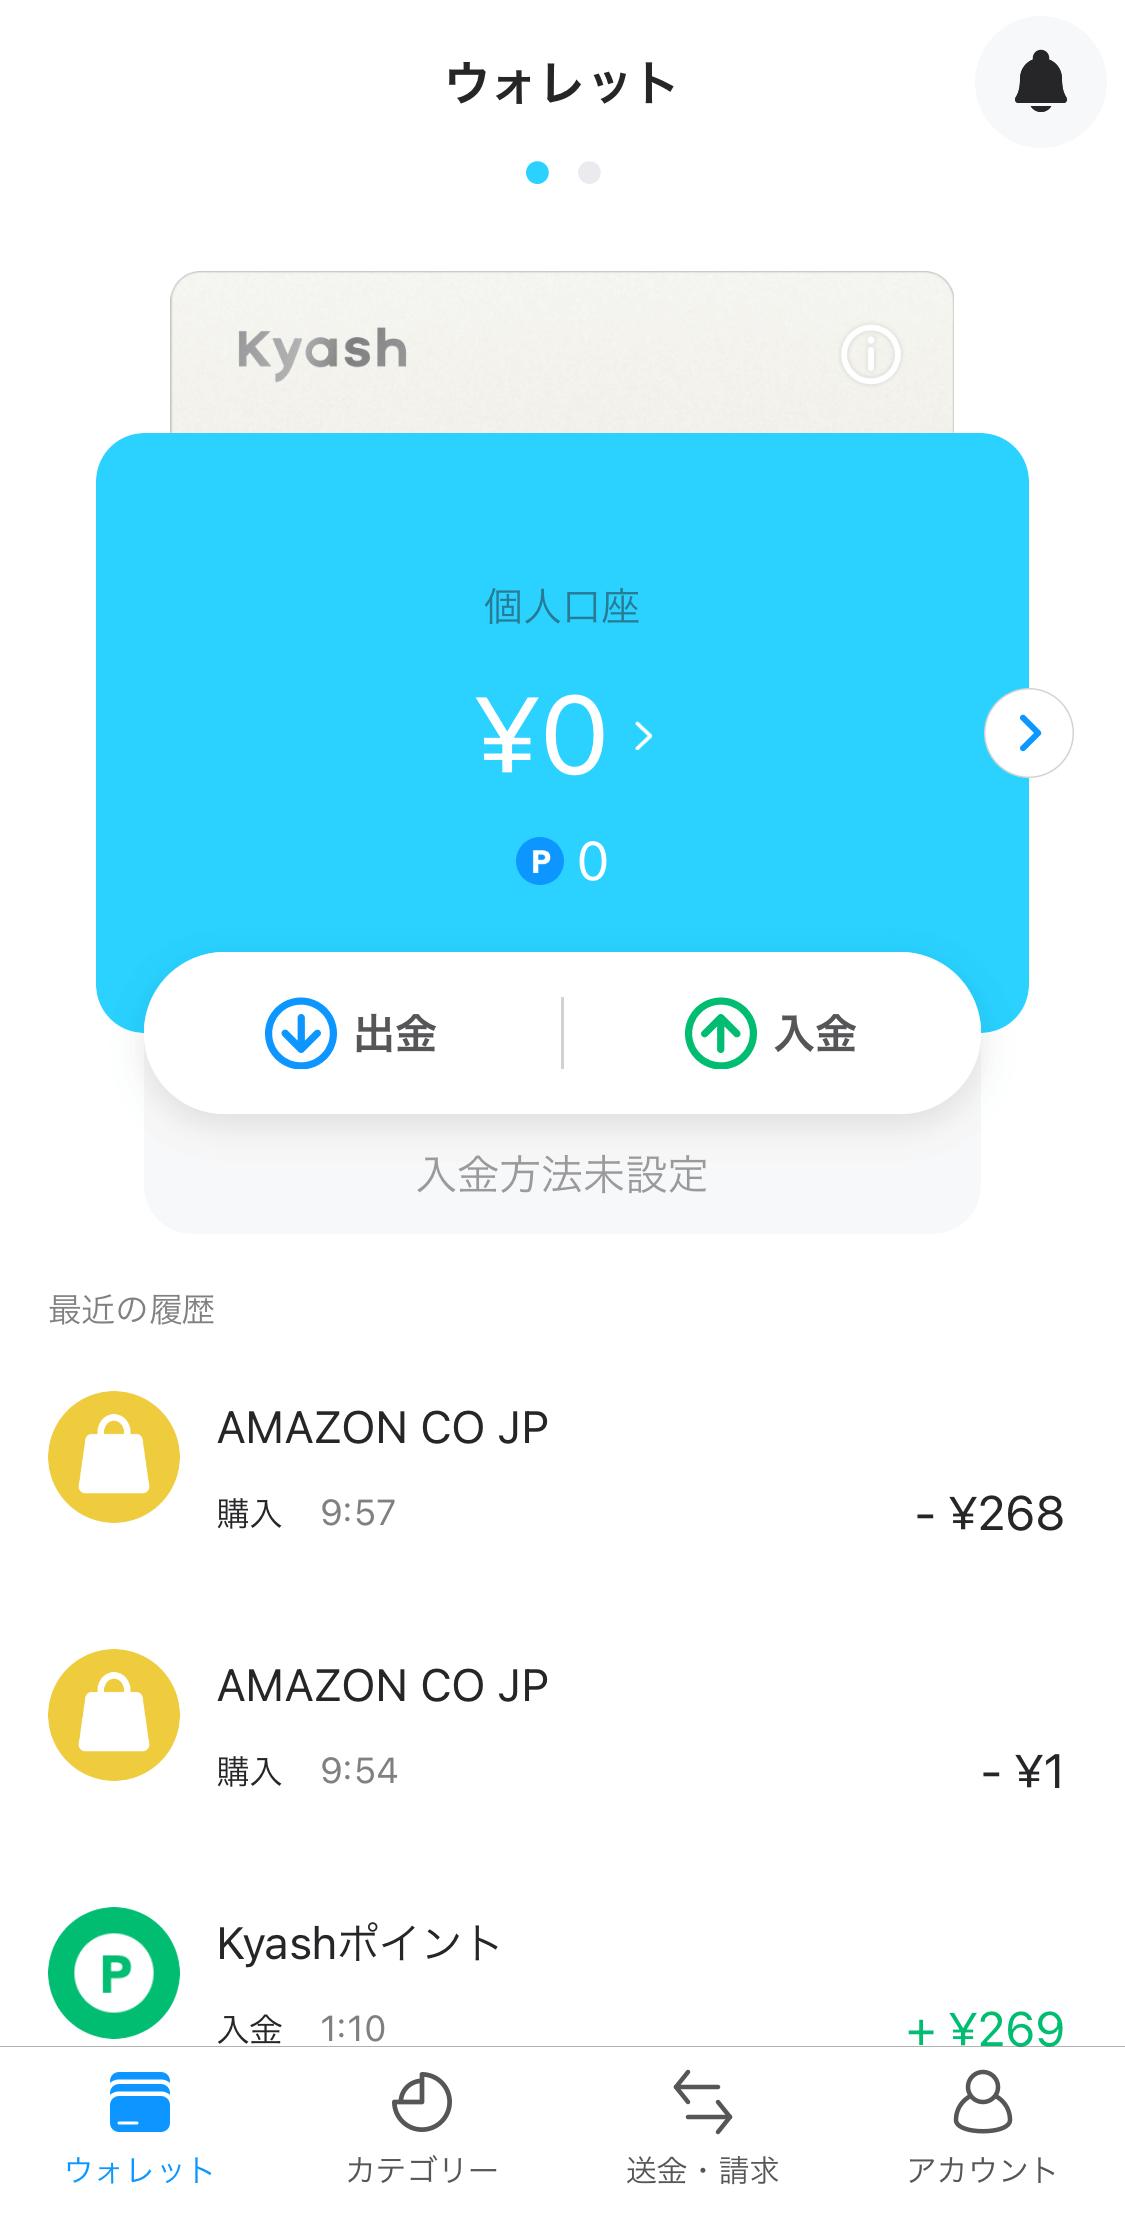 Kyashのアプリでウォレットを確認